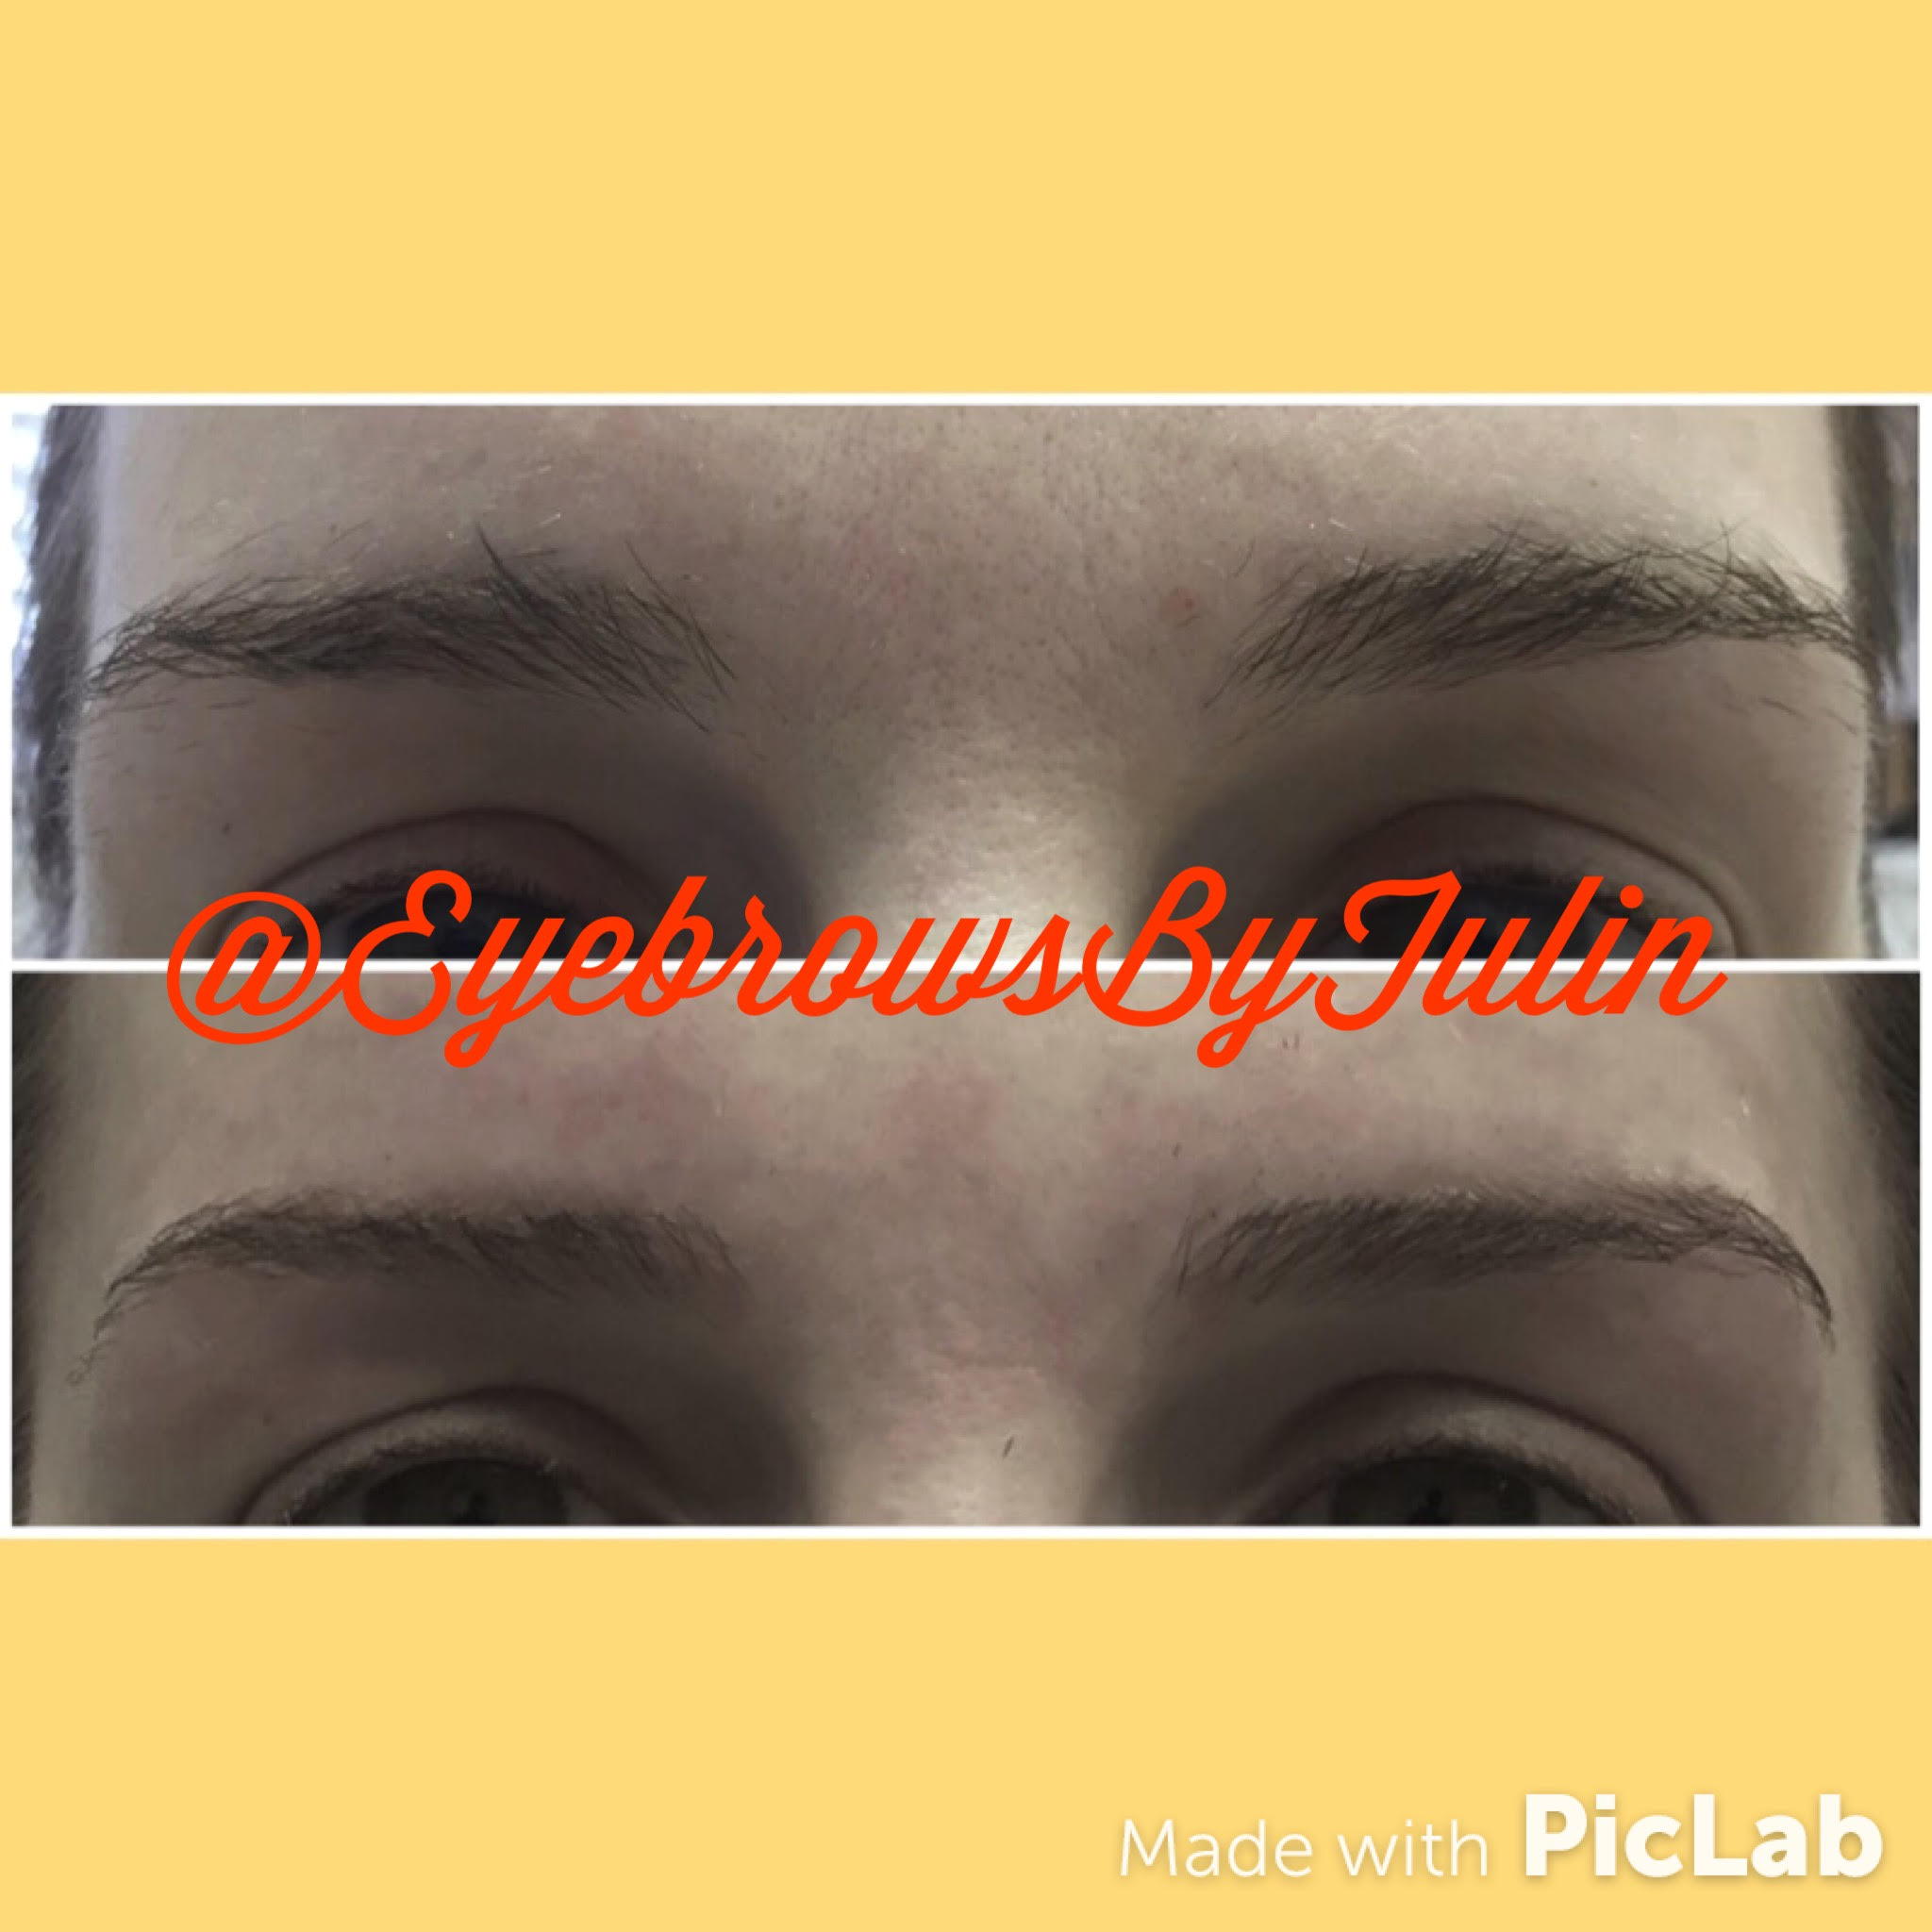 eyebrowsllc-by-tulin-slider-6-miami-coral-gables